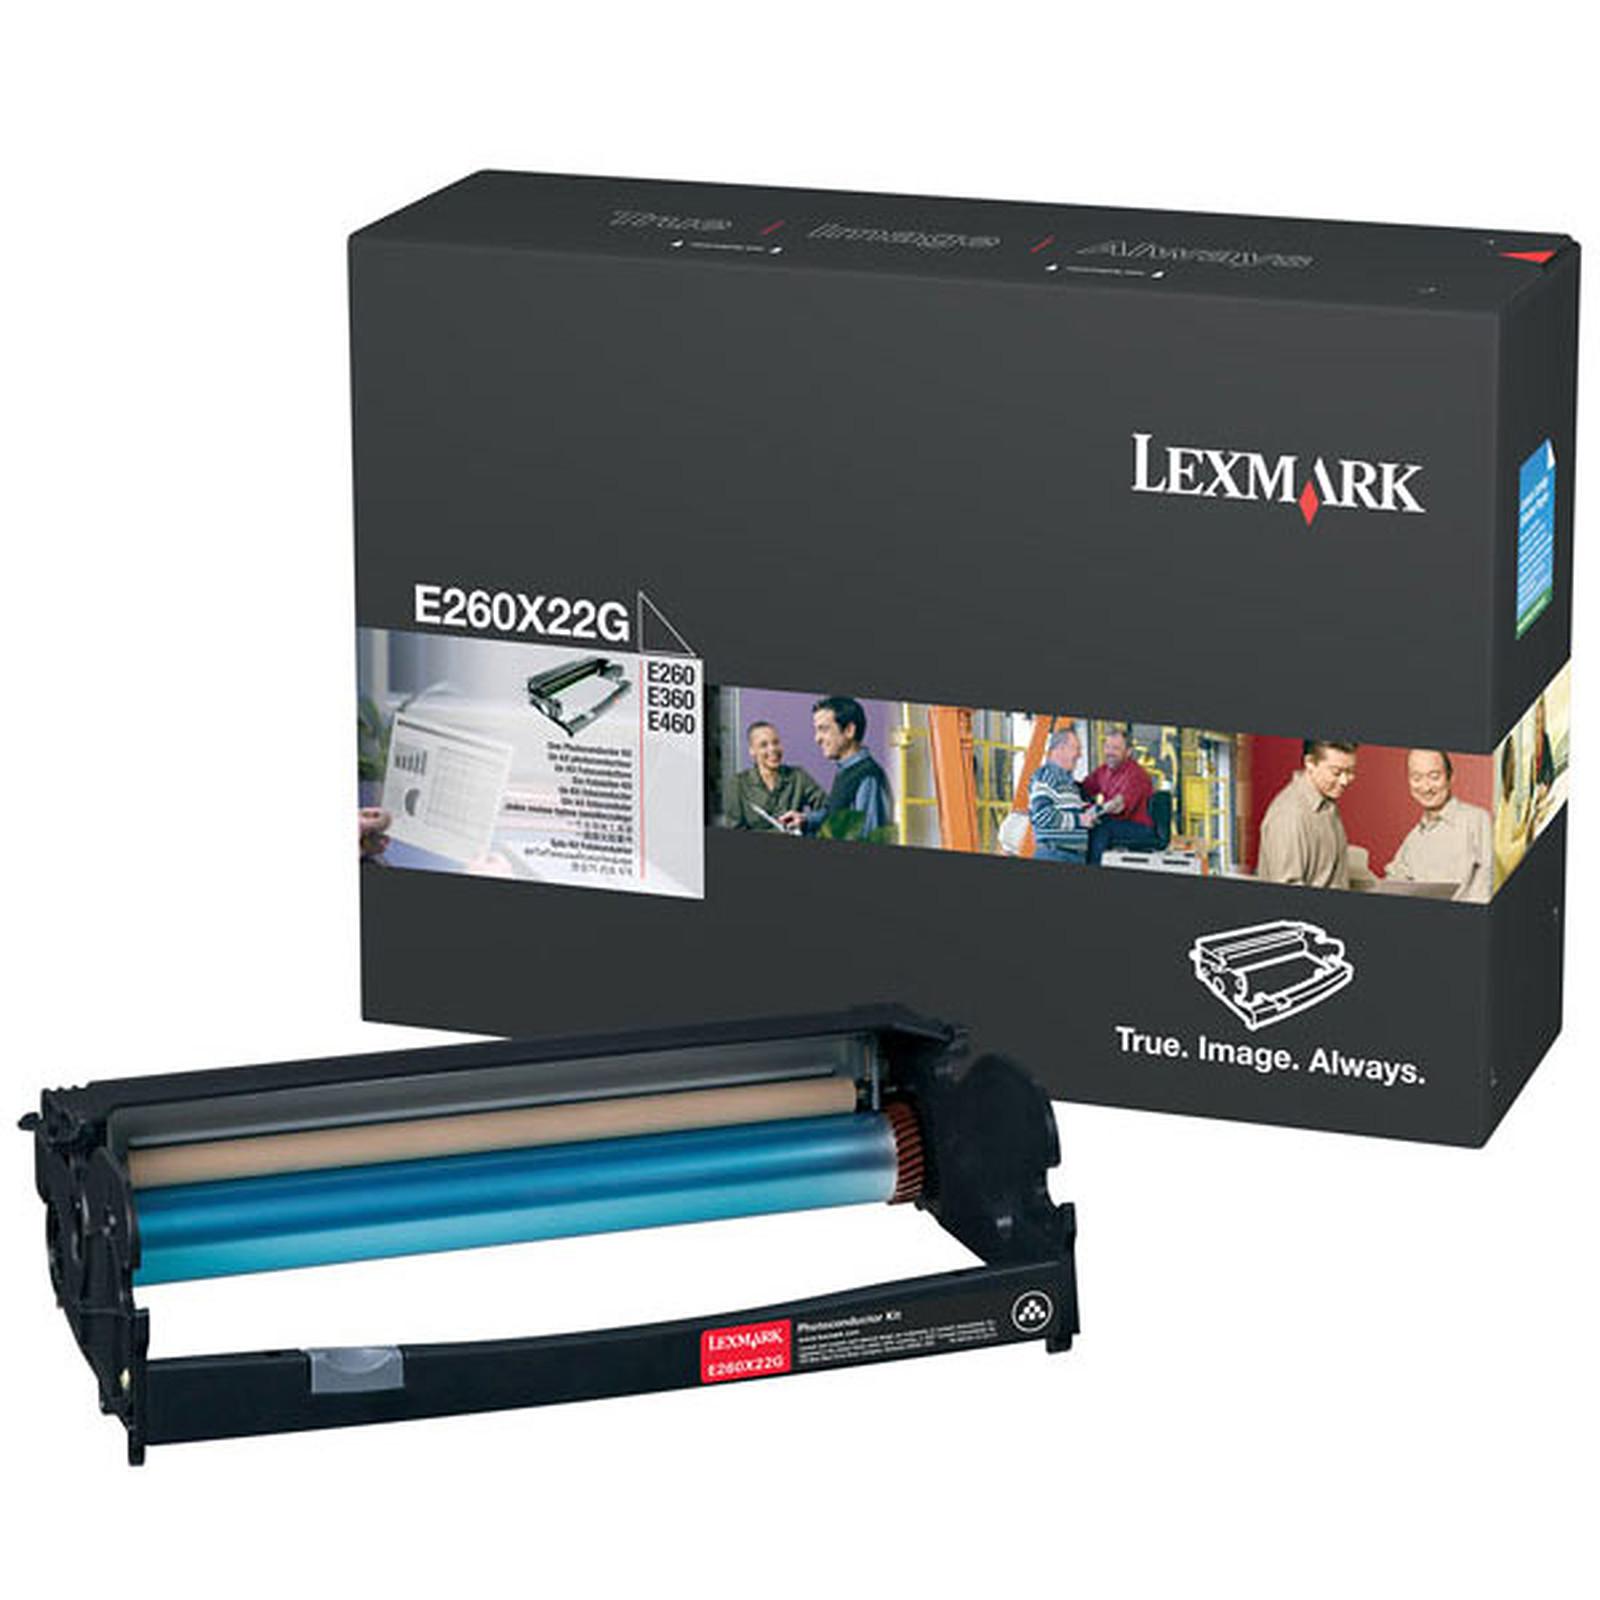 Lexmark 0E260X22G